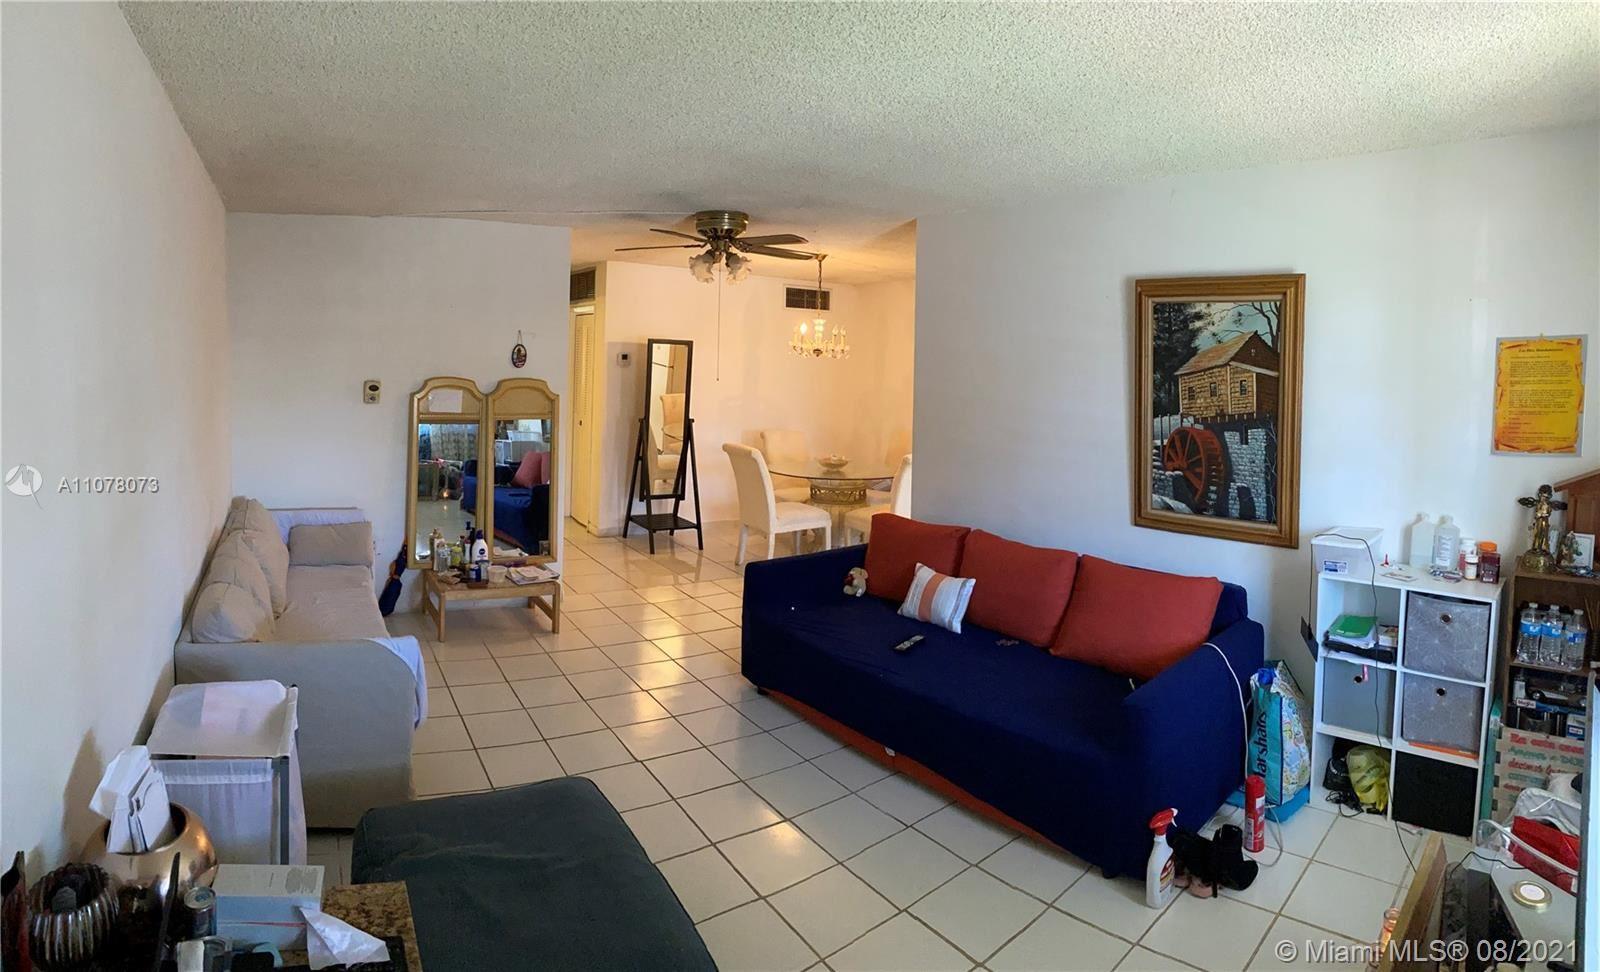 20320 NE 2nd Ave #G15, Miami Gardens, FL 33179 - #: A11078073